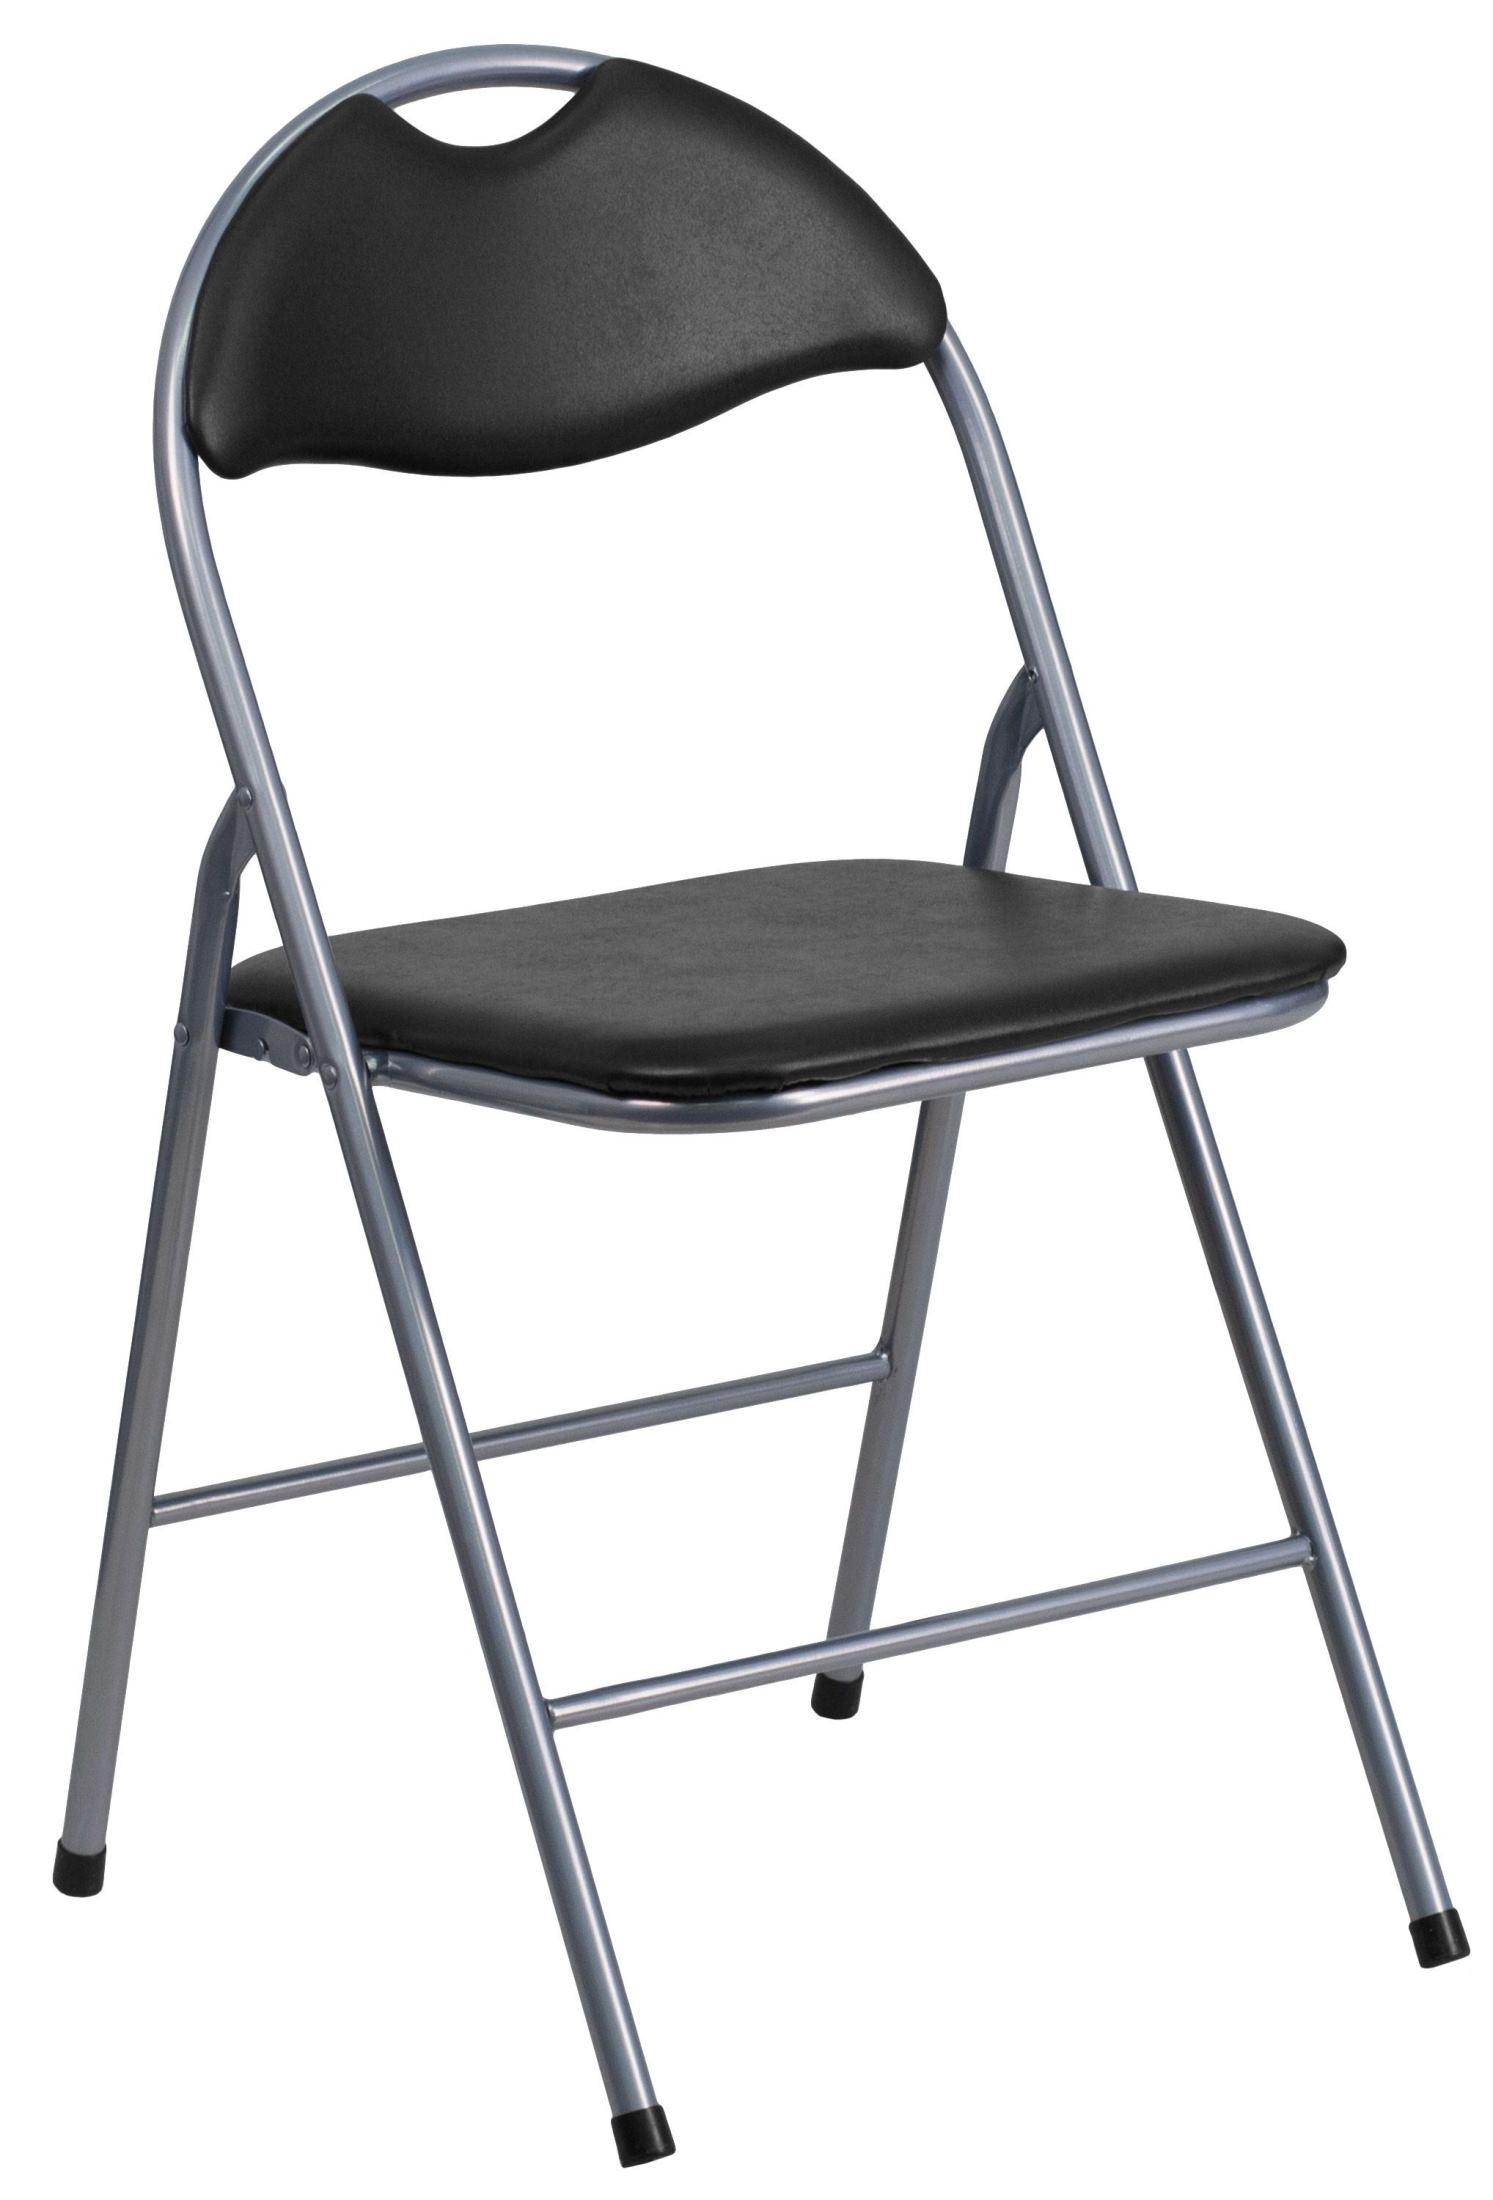 folding chair vinyl padded black leg raises hercules series metal carrying handle